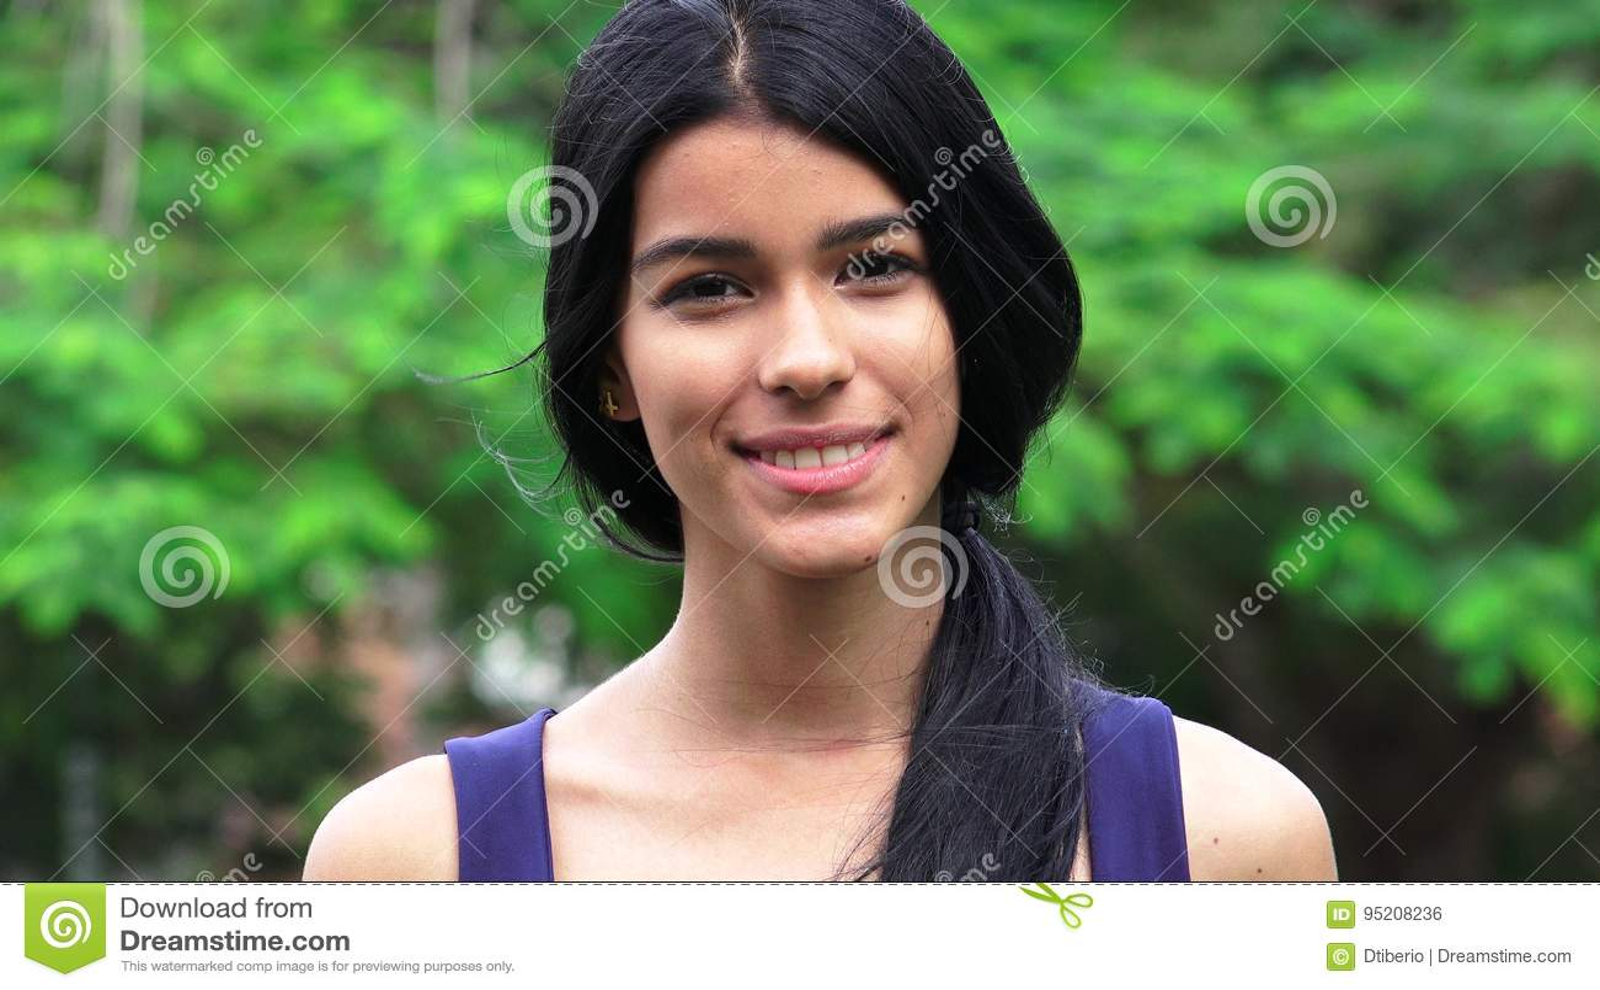 Pictures of hispanic teen